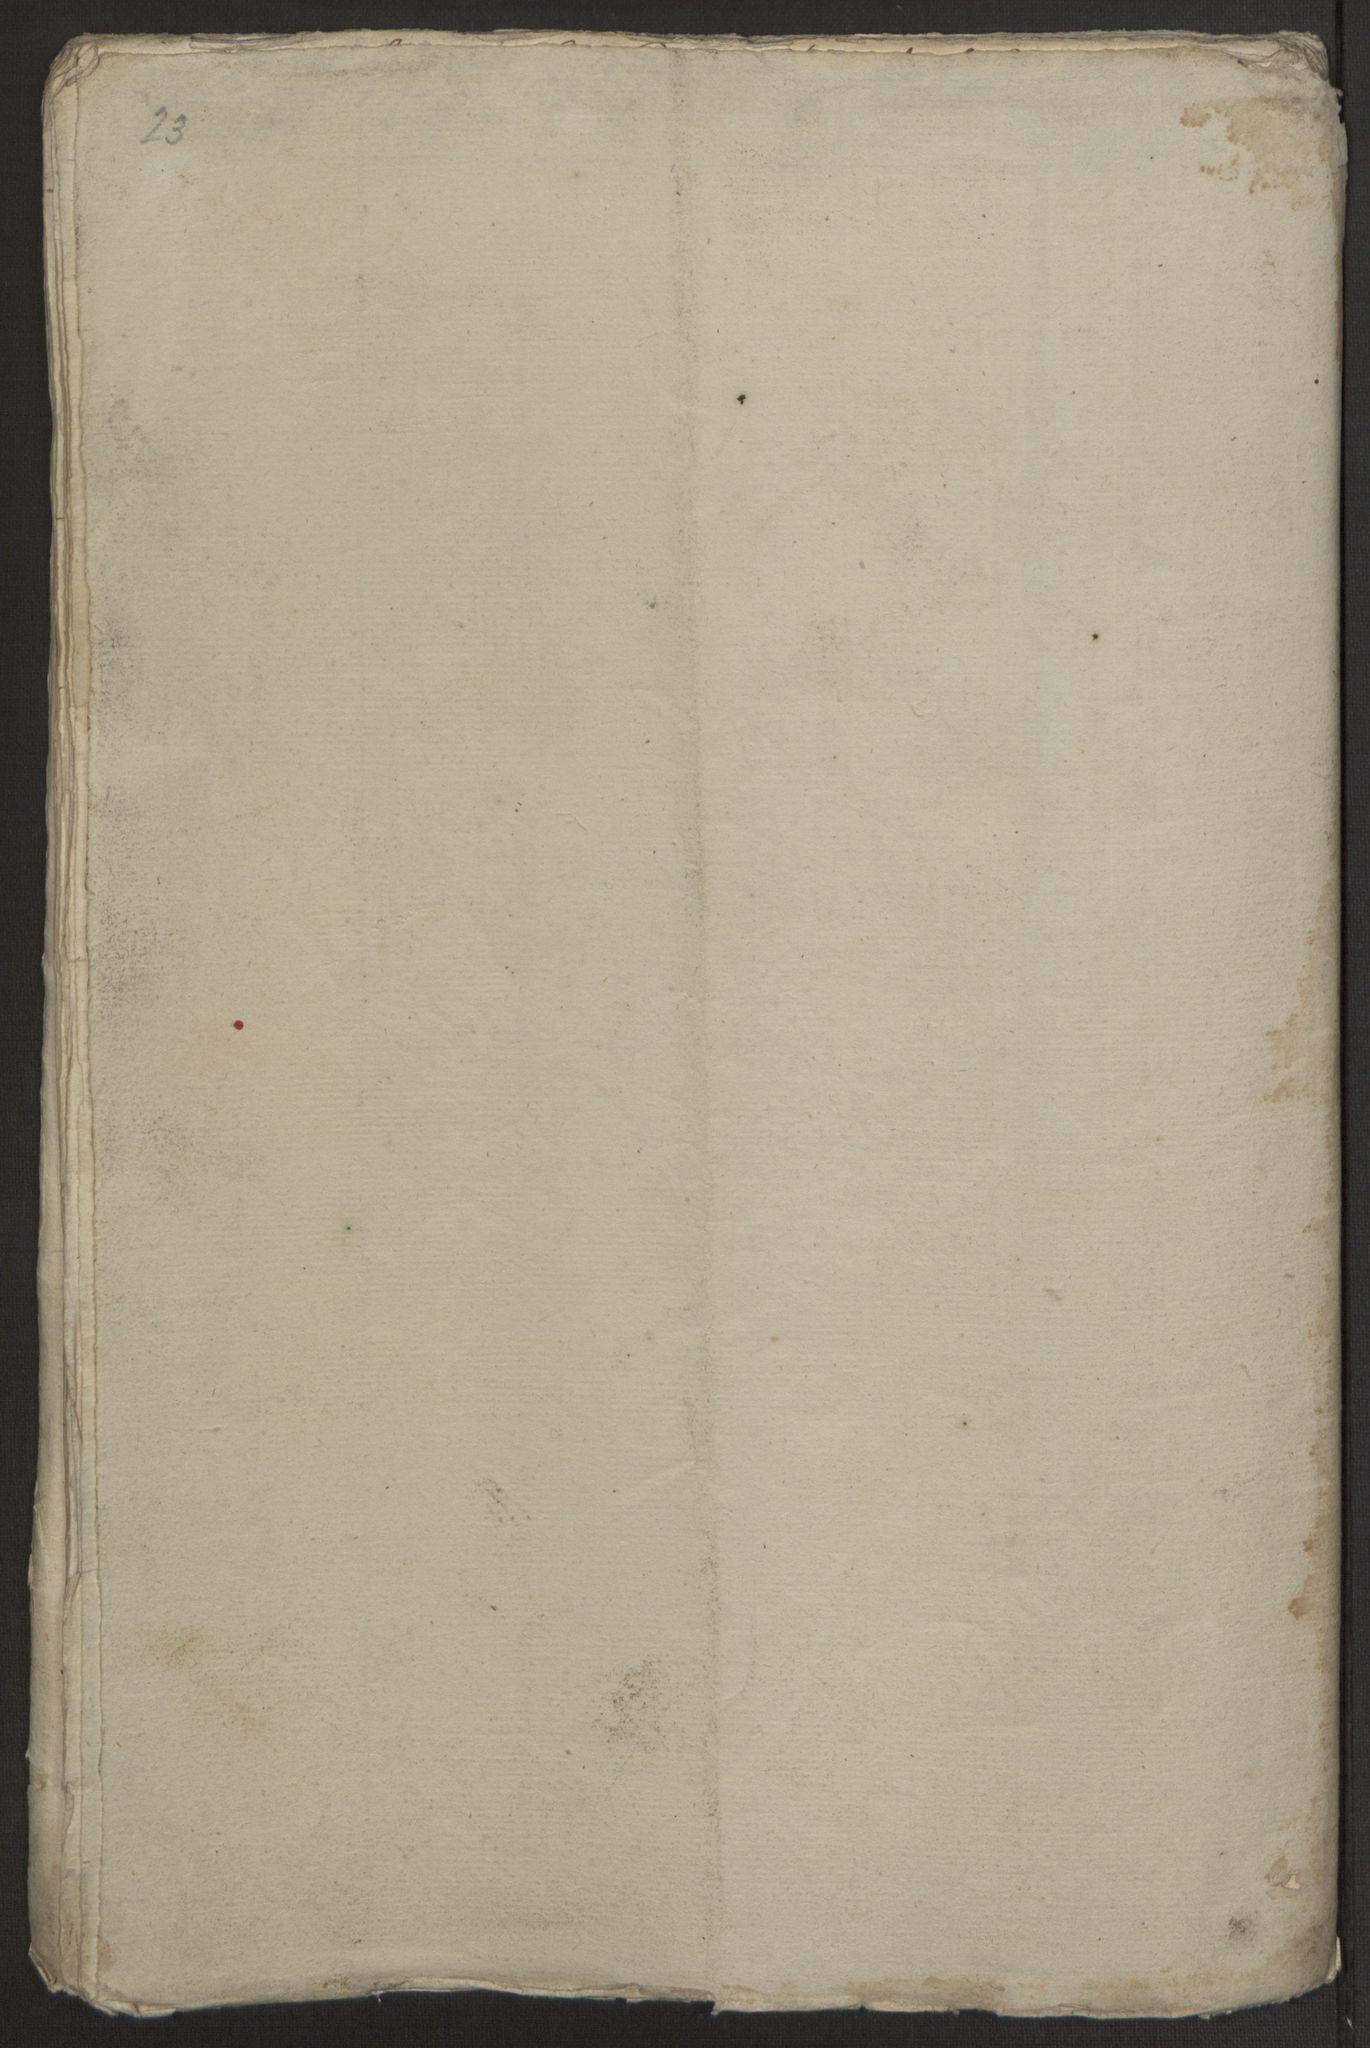 RA, Rentekammeret inntil 1814, Realistisk ordnet avdeling, Ol/L0022a: [Gg 10]: Ekstraskatten, 23.09.1762. Nordlands amt, 1763-1769, s. 240